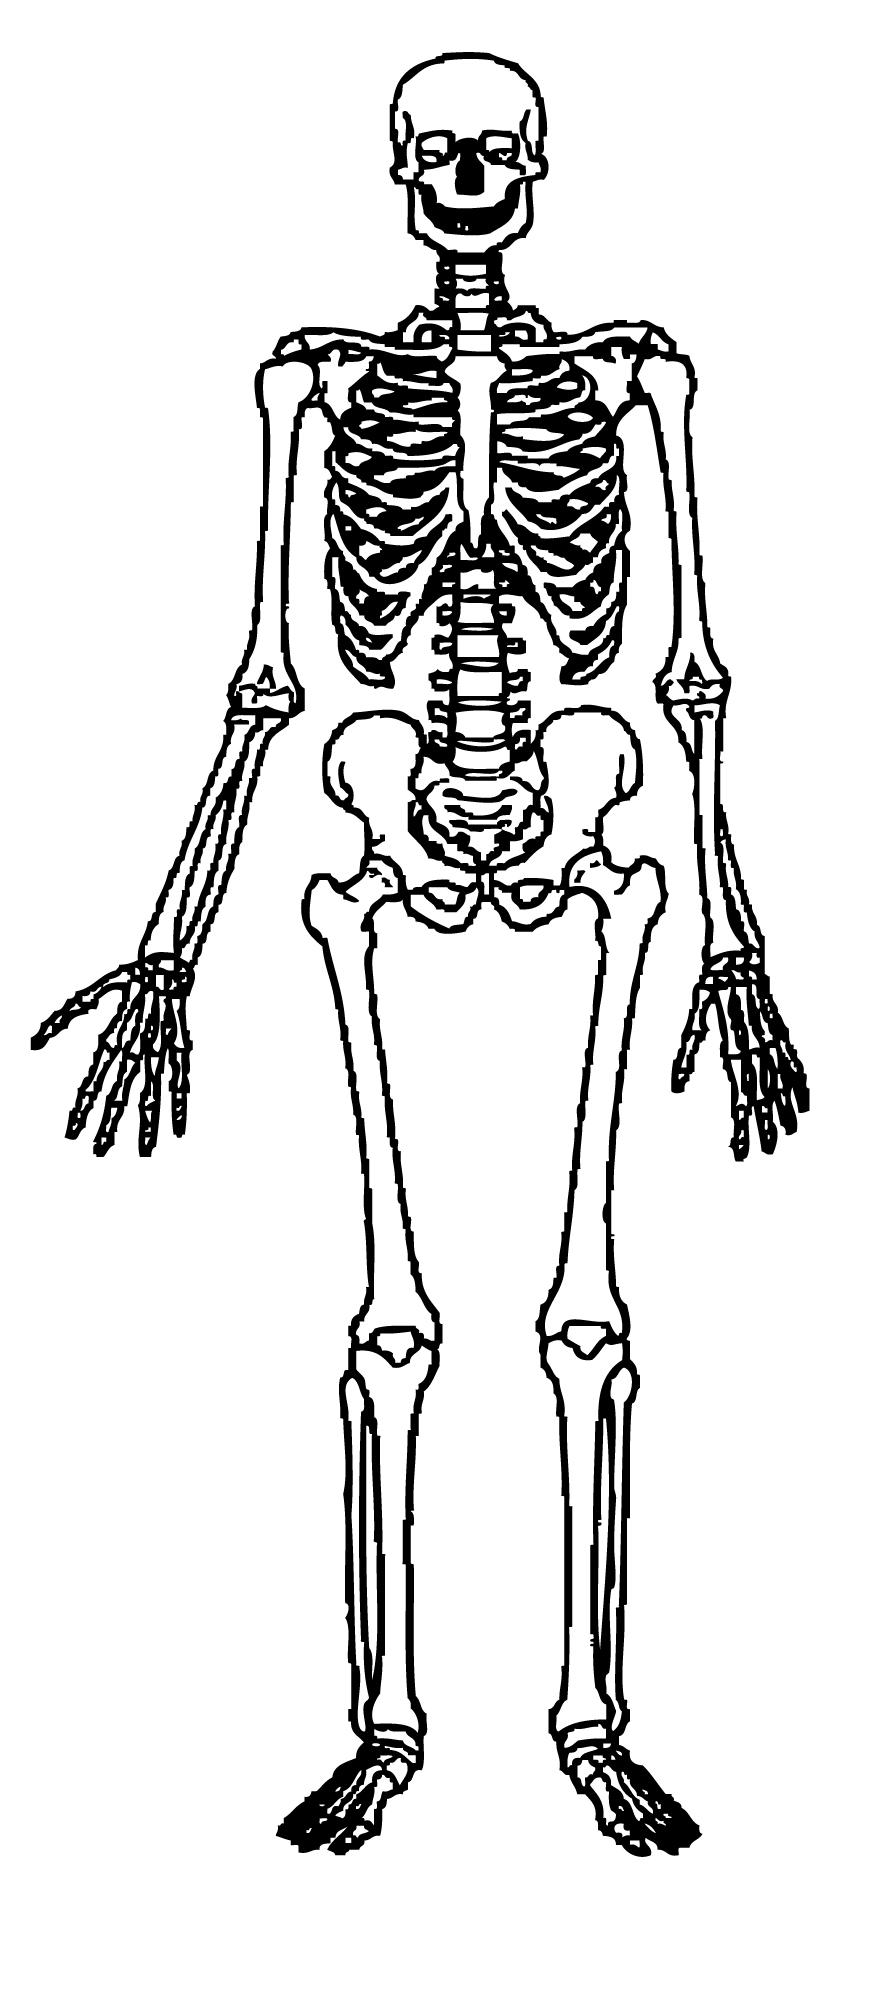 Skeleton clipart #3, Download drawings